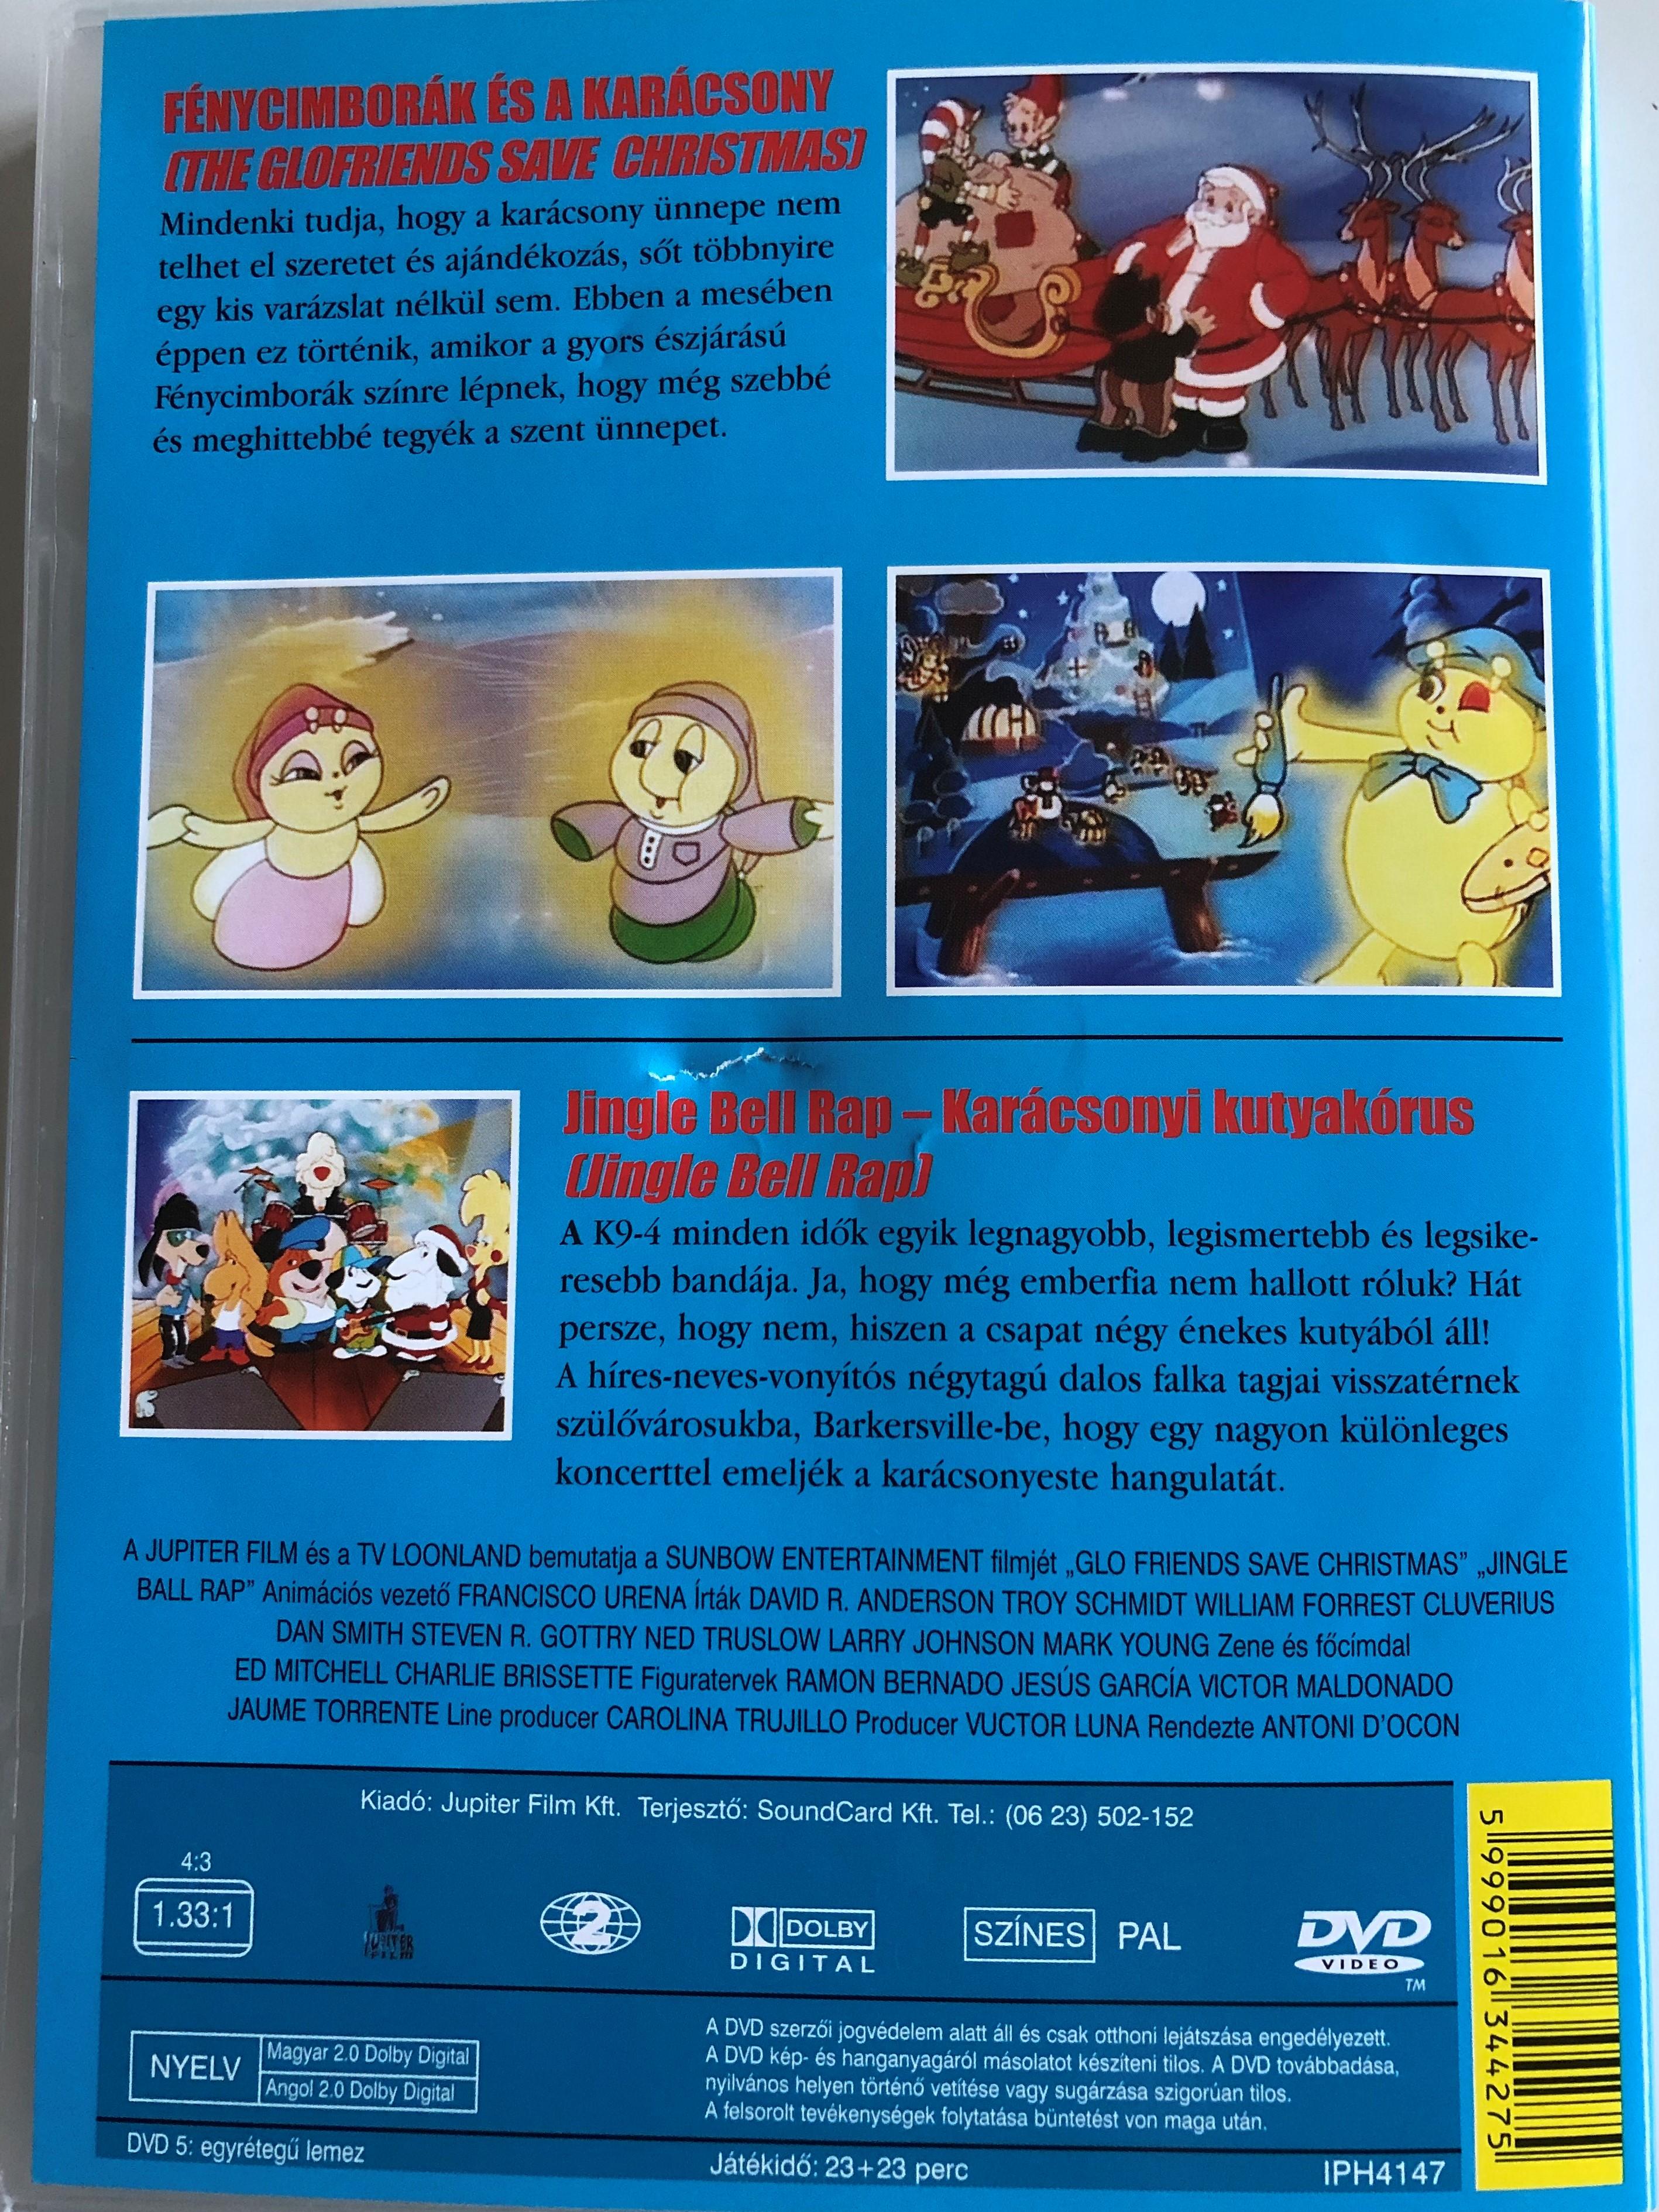 the-glo-friends-save-christmas-dvd-1985-f-nycimbor-k-s-a-kar-csony-jingle-bell-rap-kar-csonyi-kutyak-rus-directed-by-antoni-d-ocon-2-.jpg